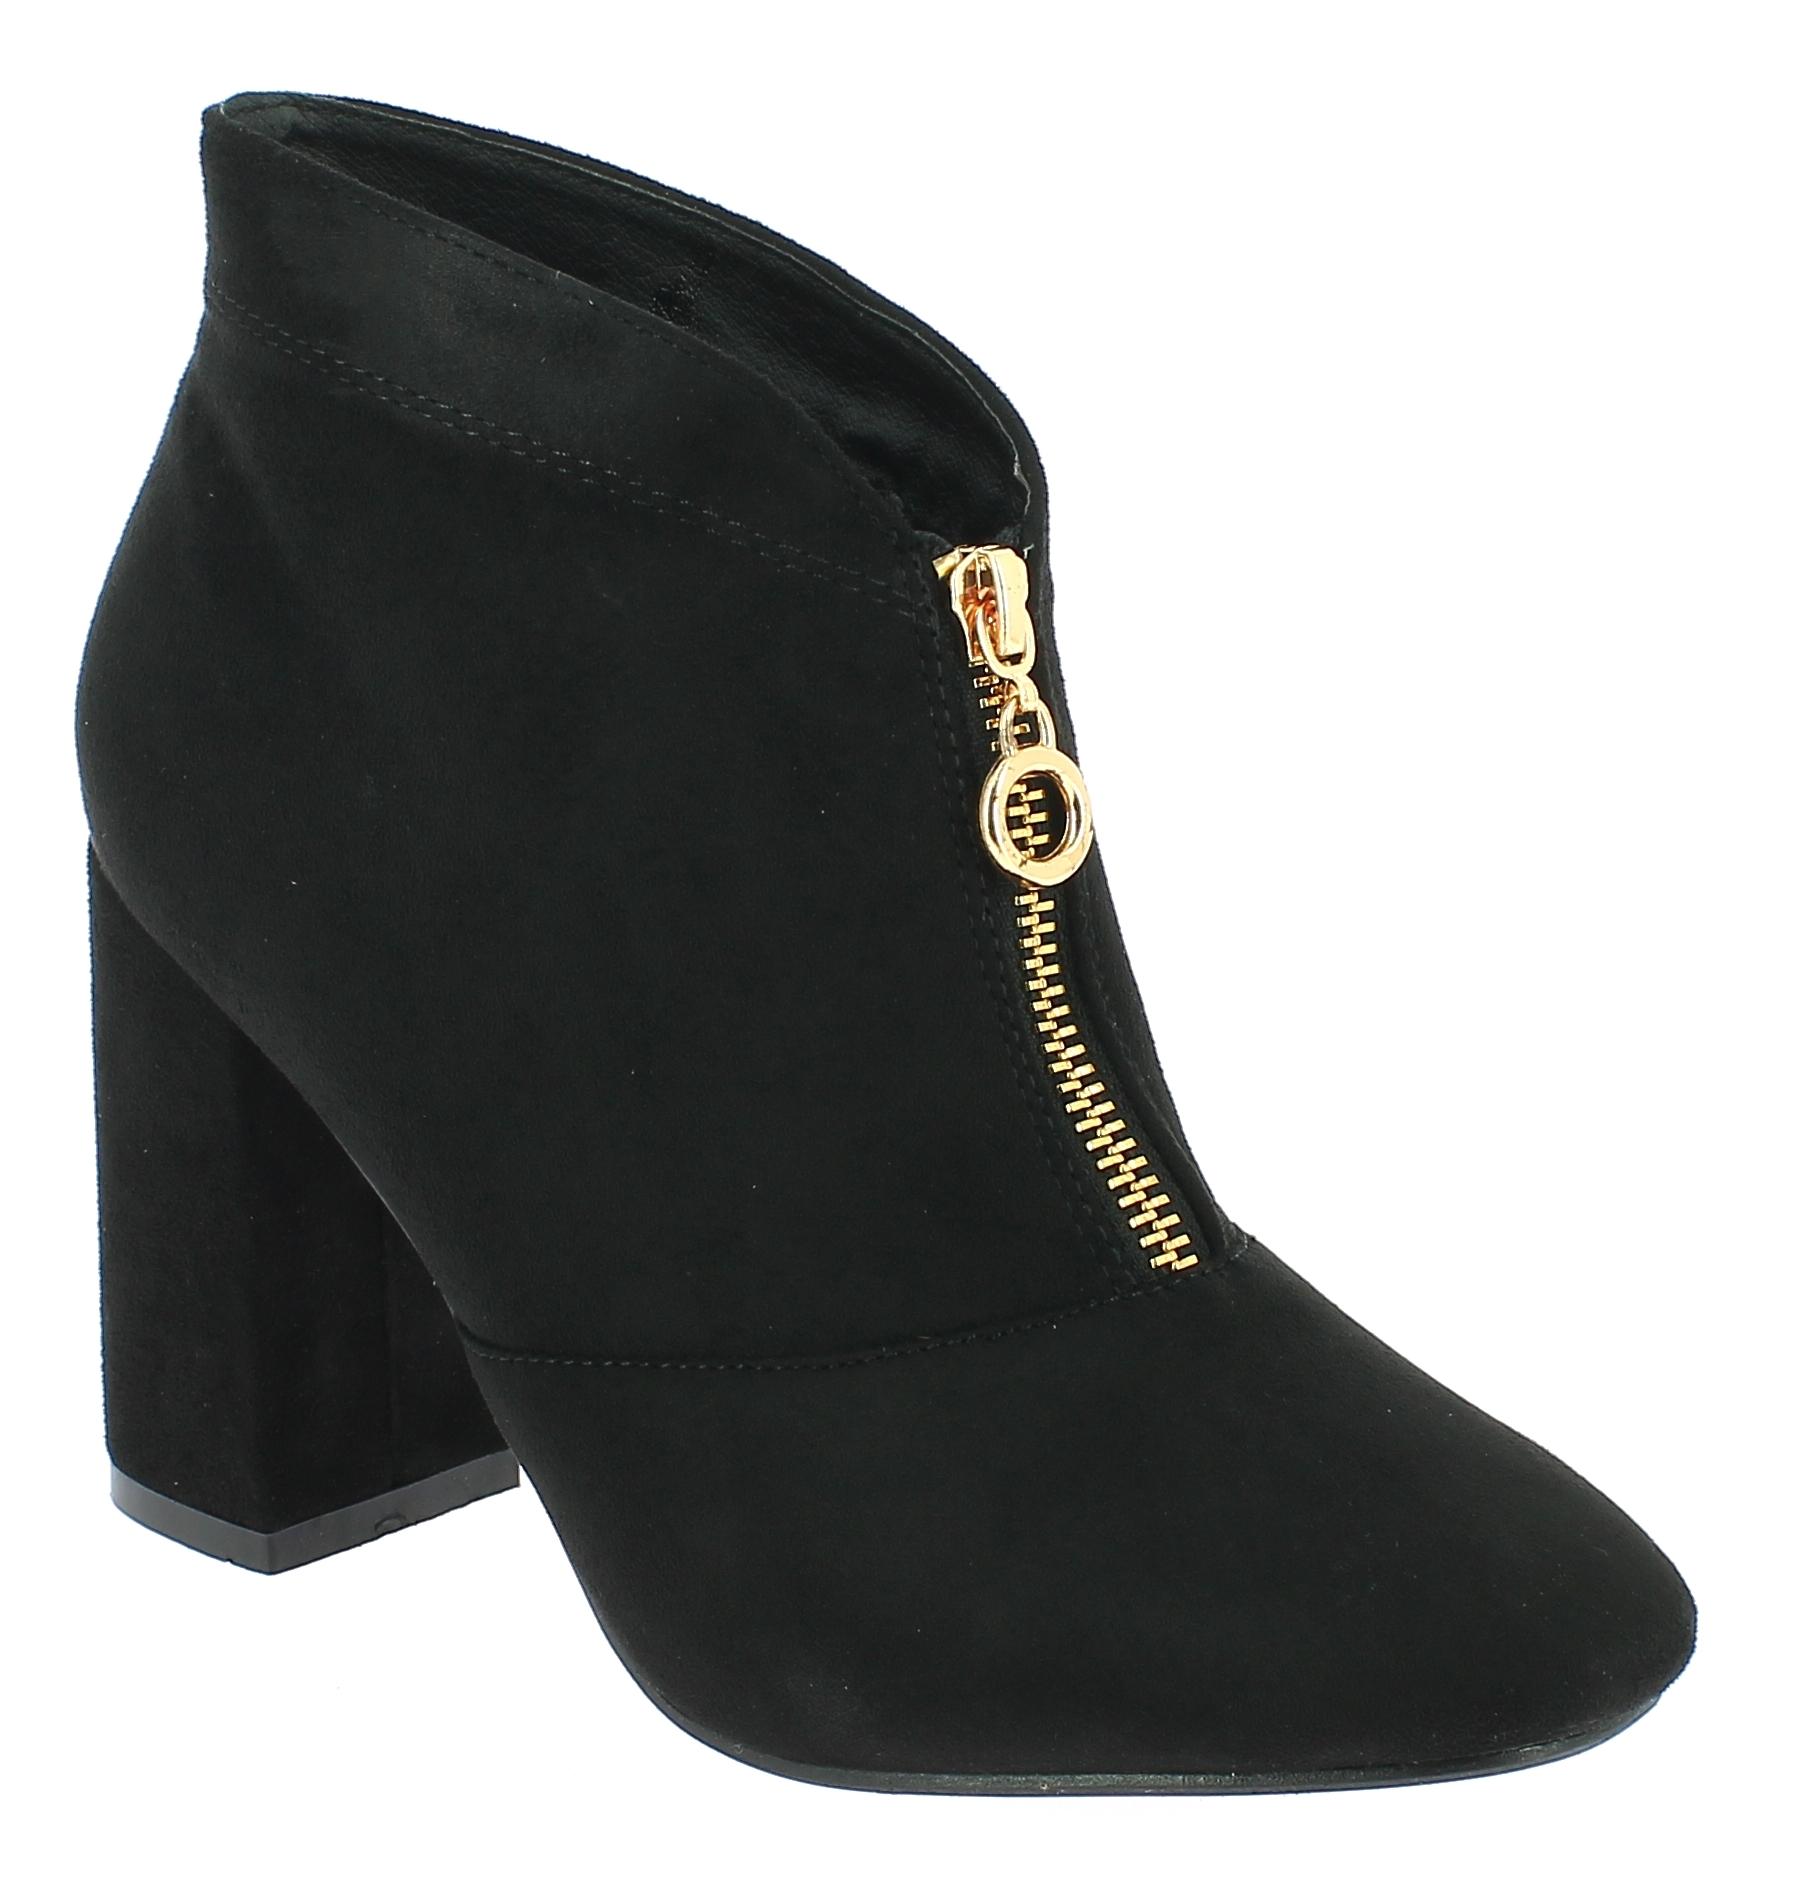 TOPWAY Γυναικείο Μποτάκι B097833 Μαύρο - IqShoes - B097833 BLACK-black-36/1/15/7 παπούτσια  γυναικεία μποτάκια